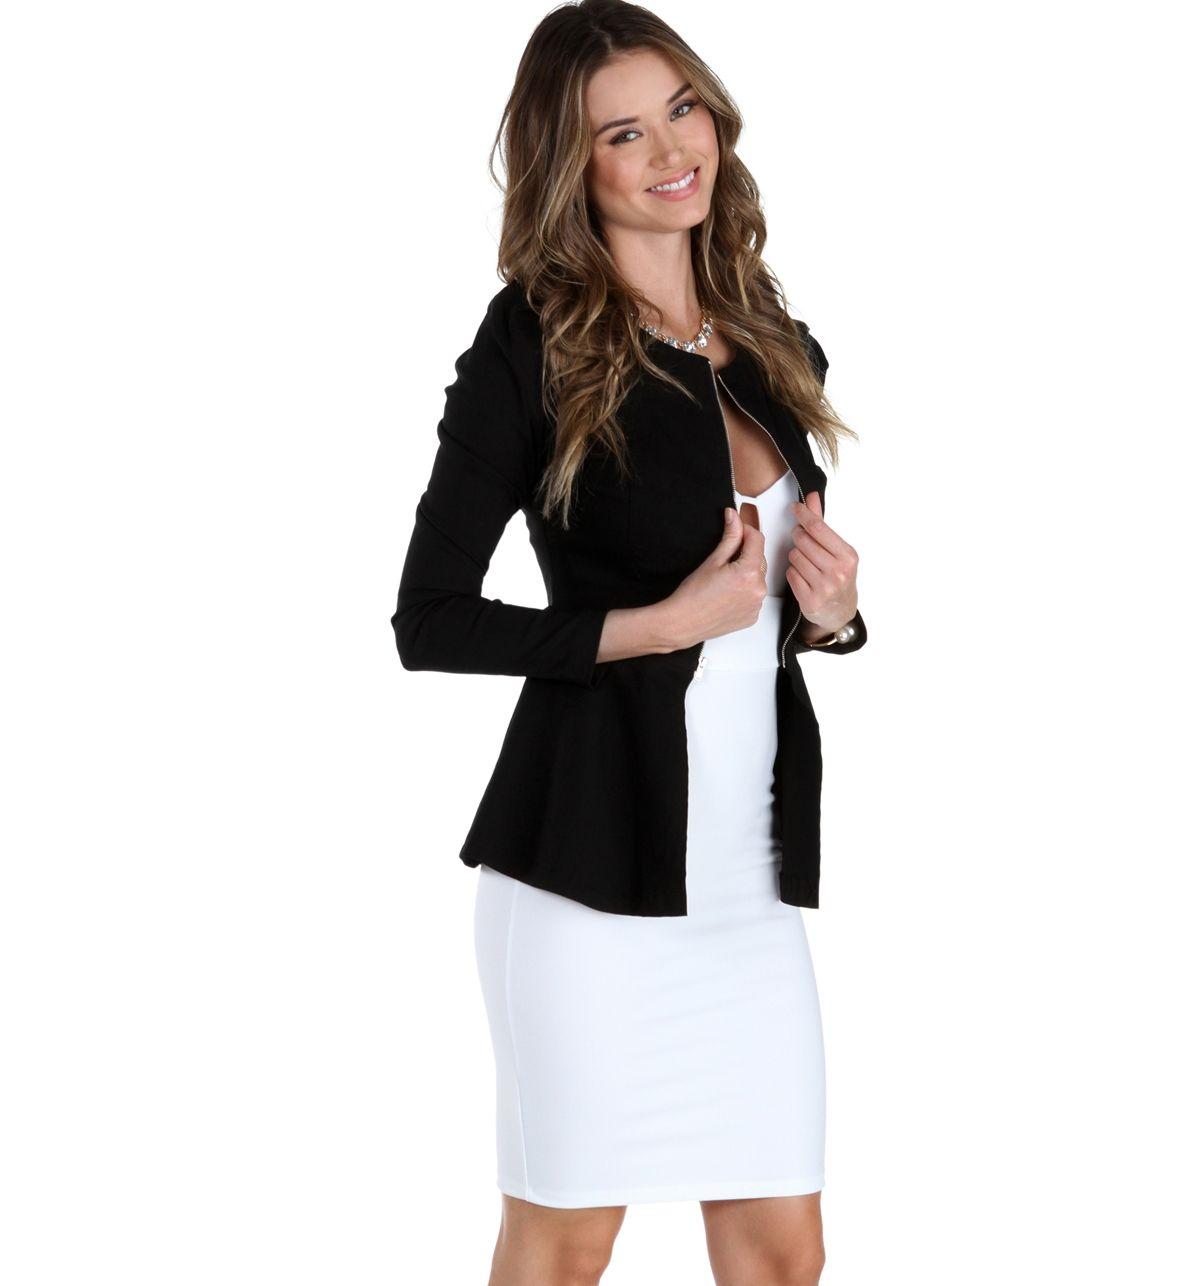 Black Peplum Jacket at WindsorStore